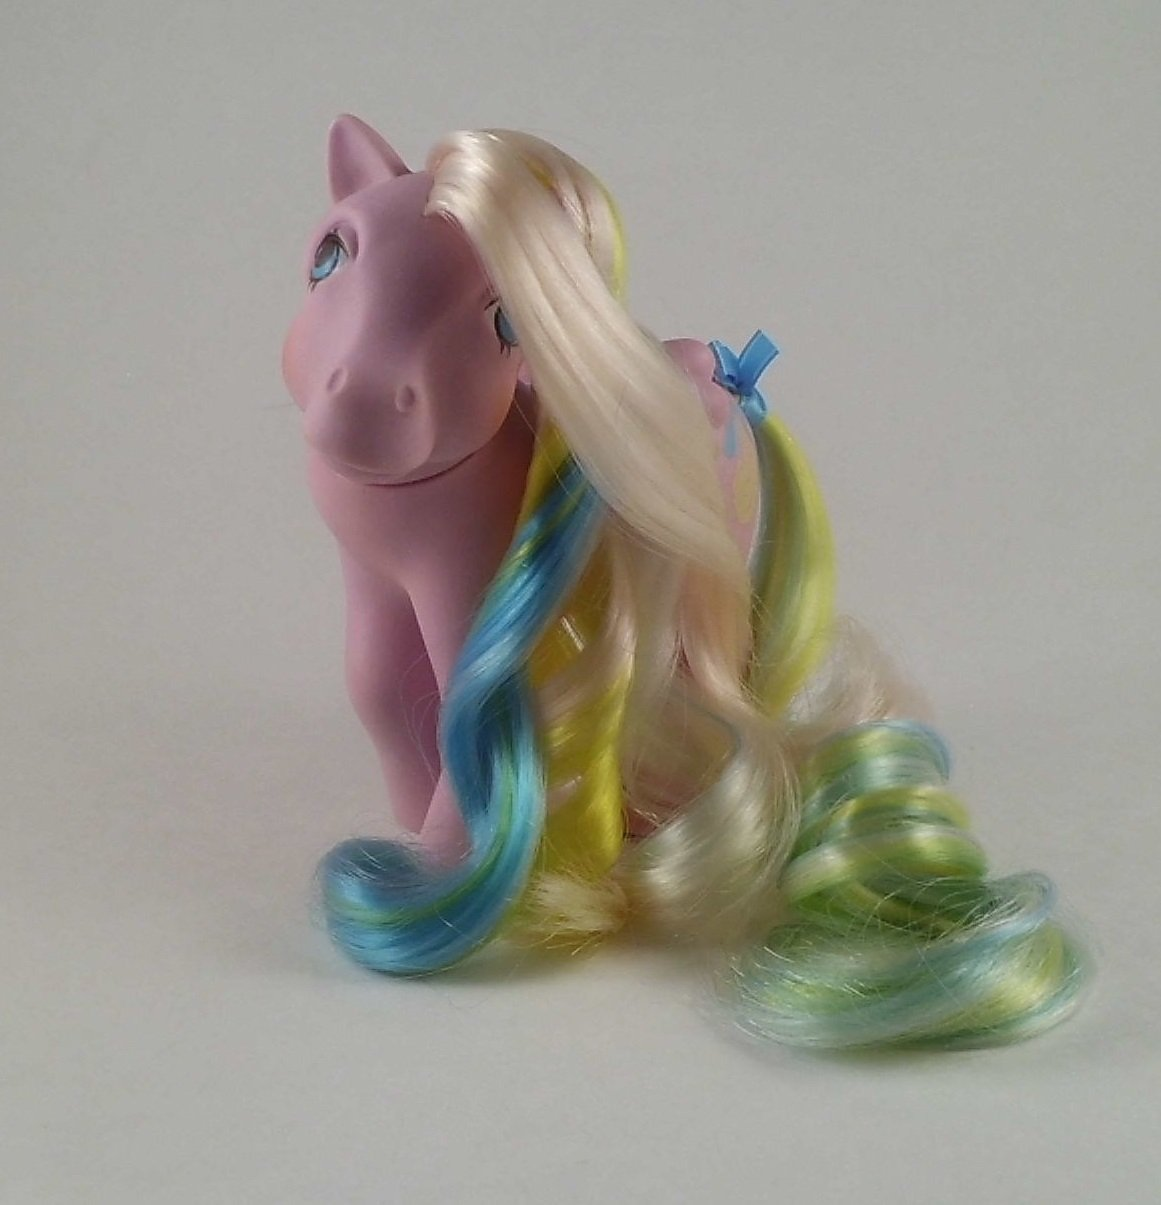 My Little Pony Brush 'n Grow Curly Locks 2